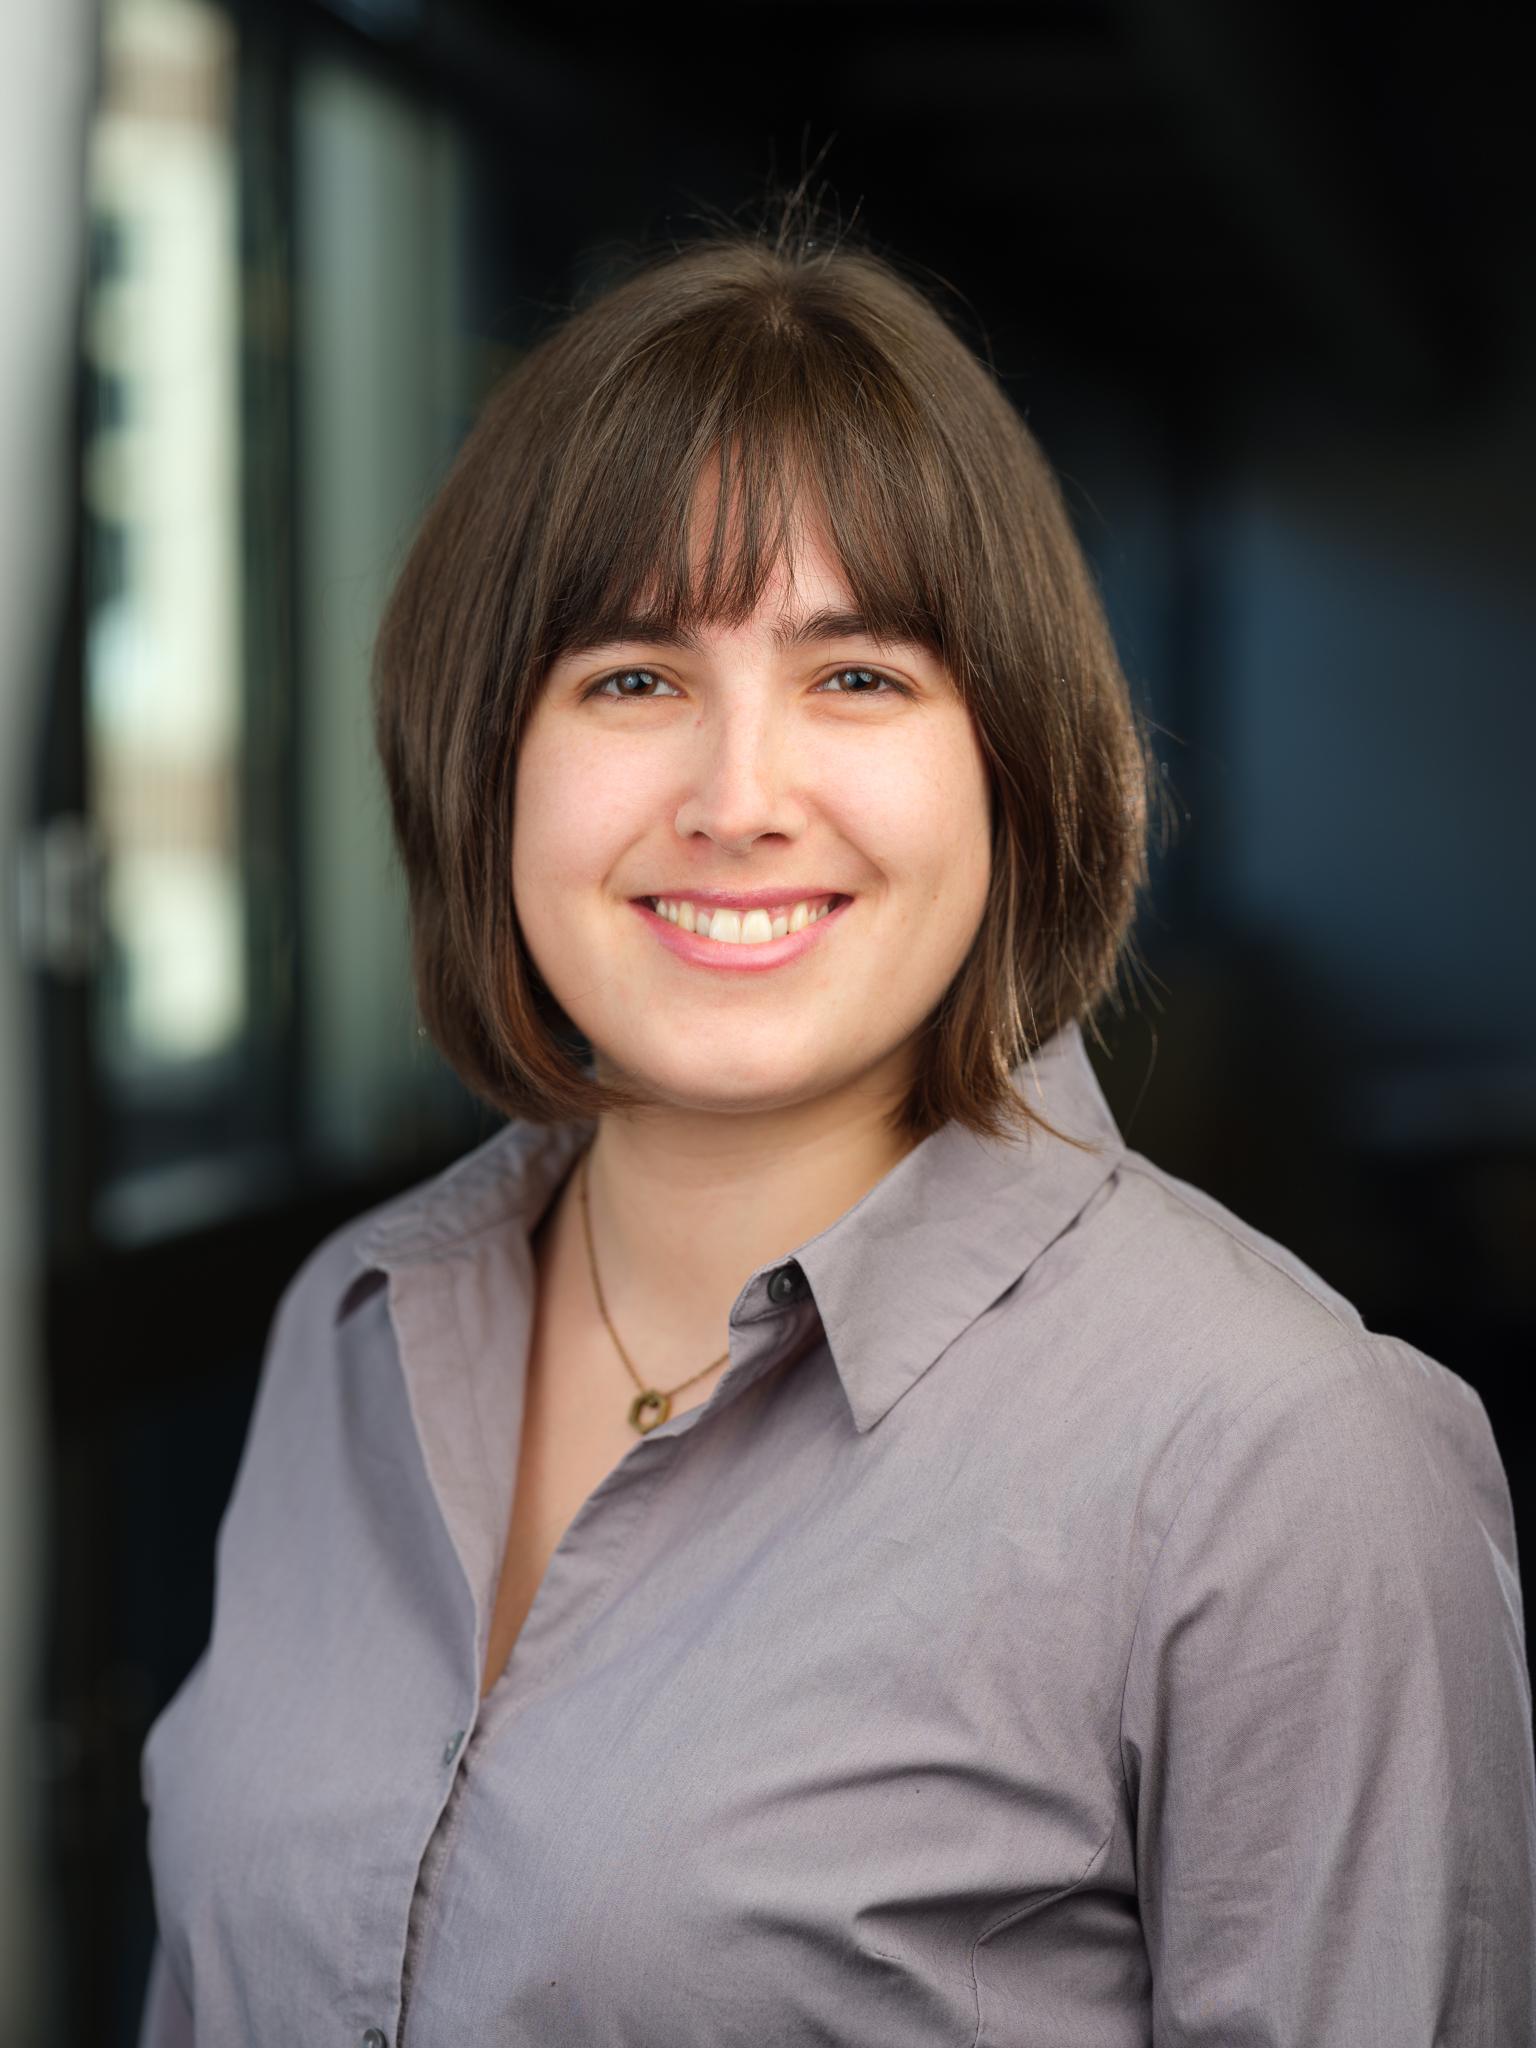 Kelsey Saulnier